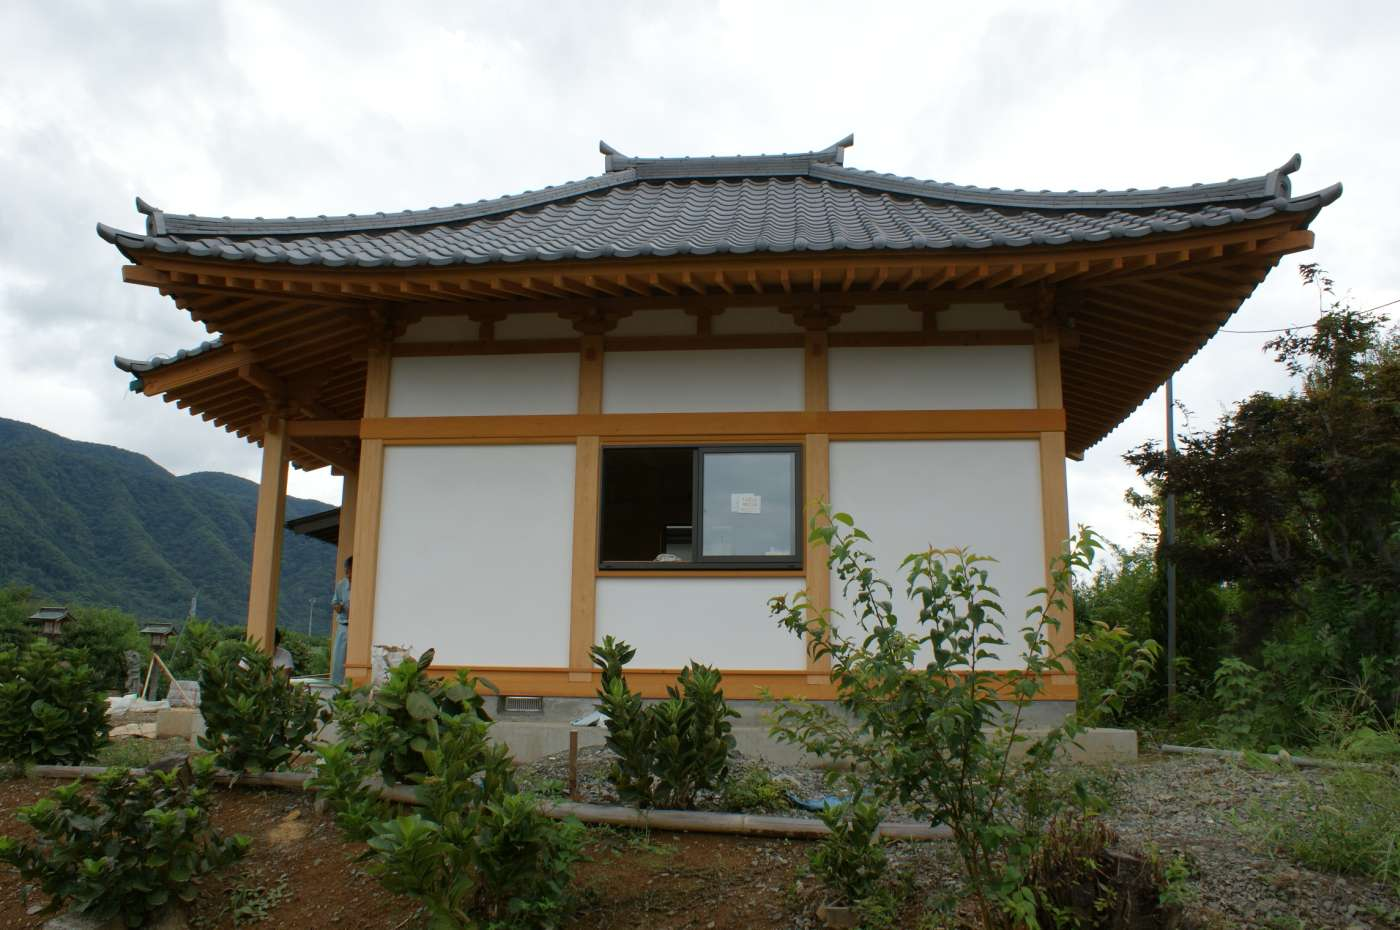 http://sumainomatsuki.com/folder1/DSC04888.JPG